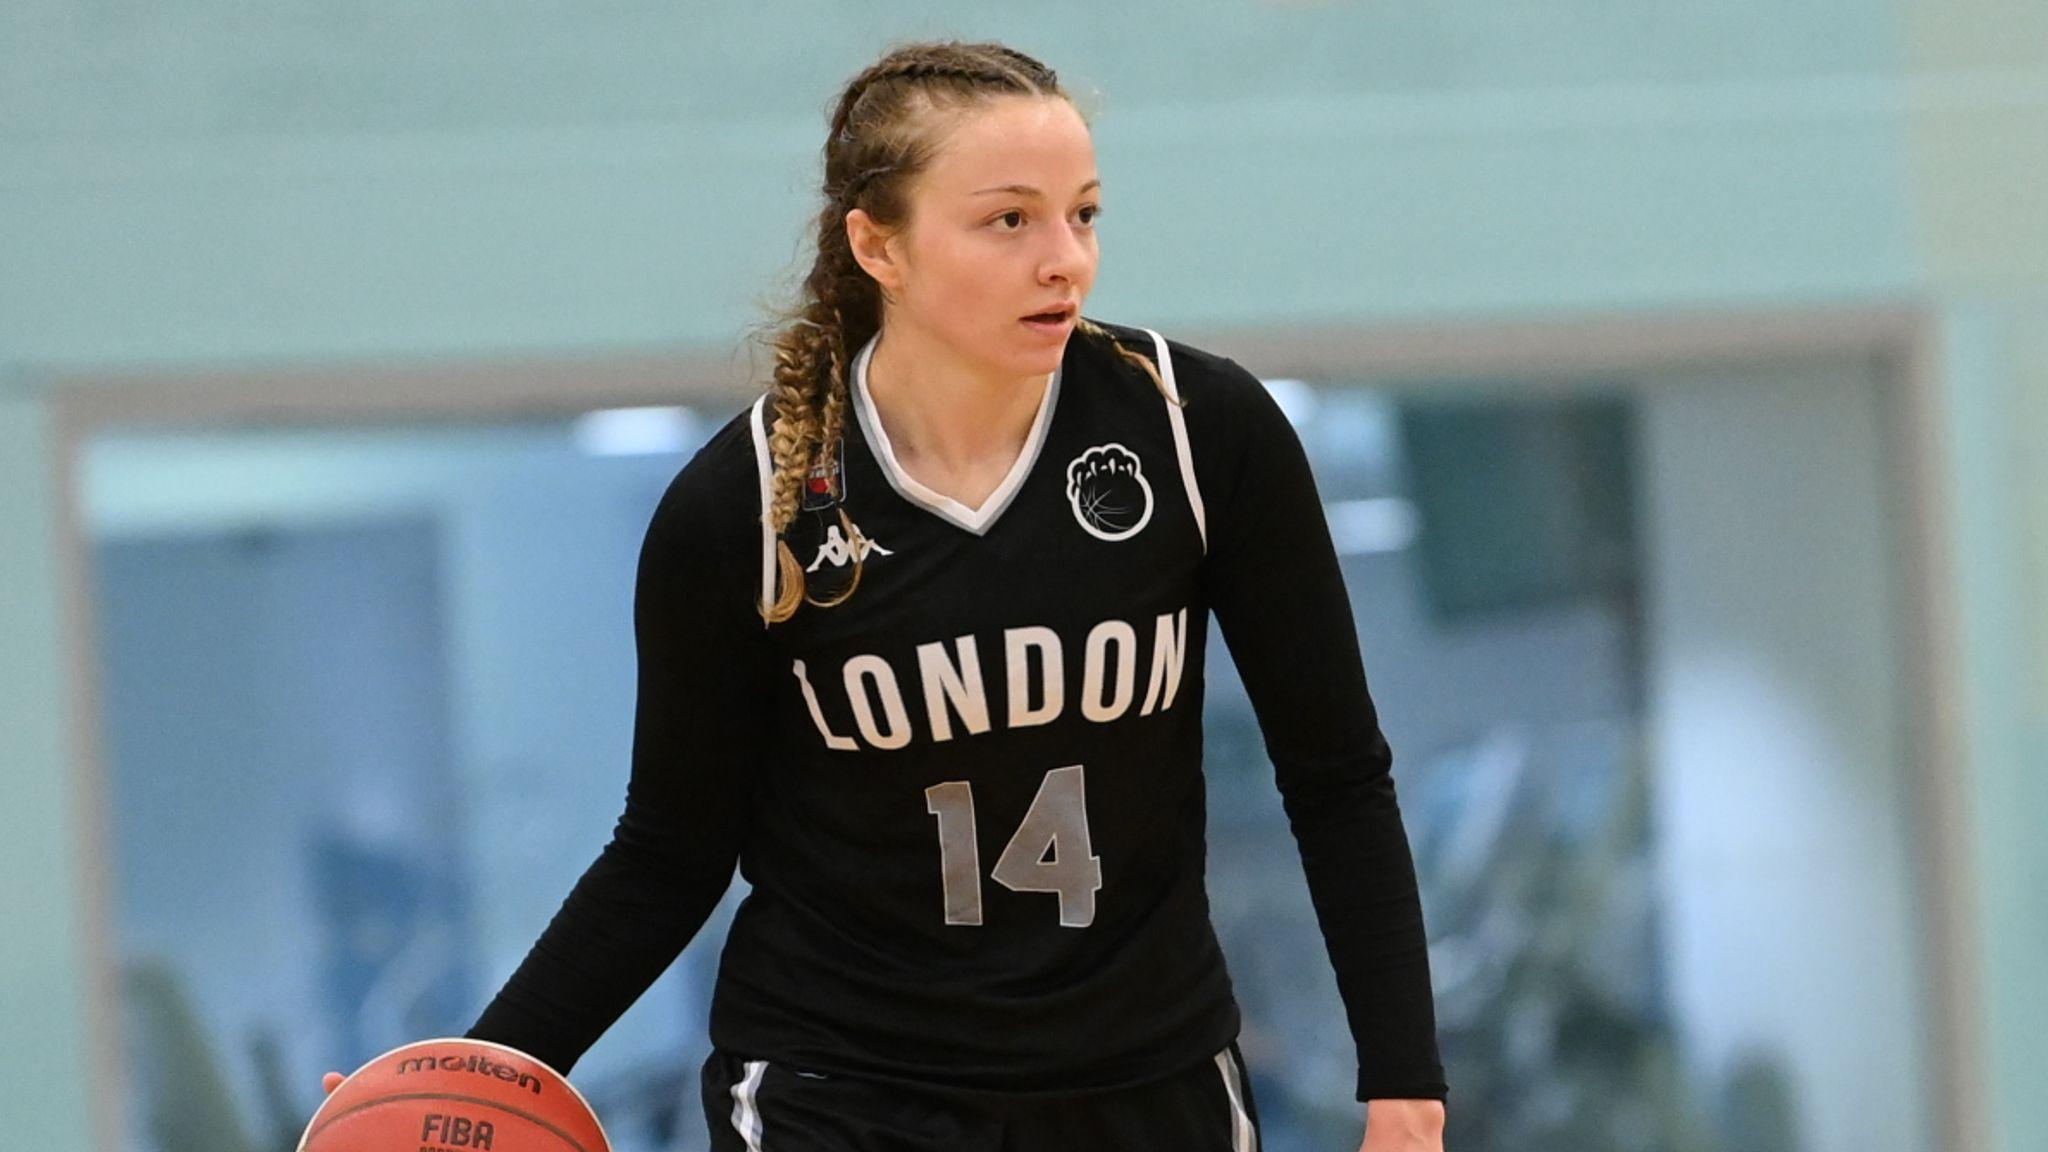 London Lions Women's Team keep building ahead of EuroCup Qualifier